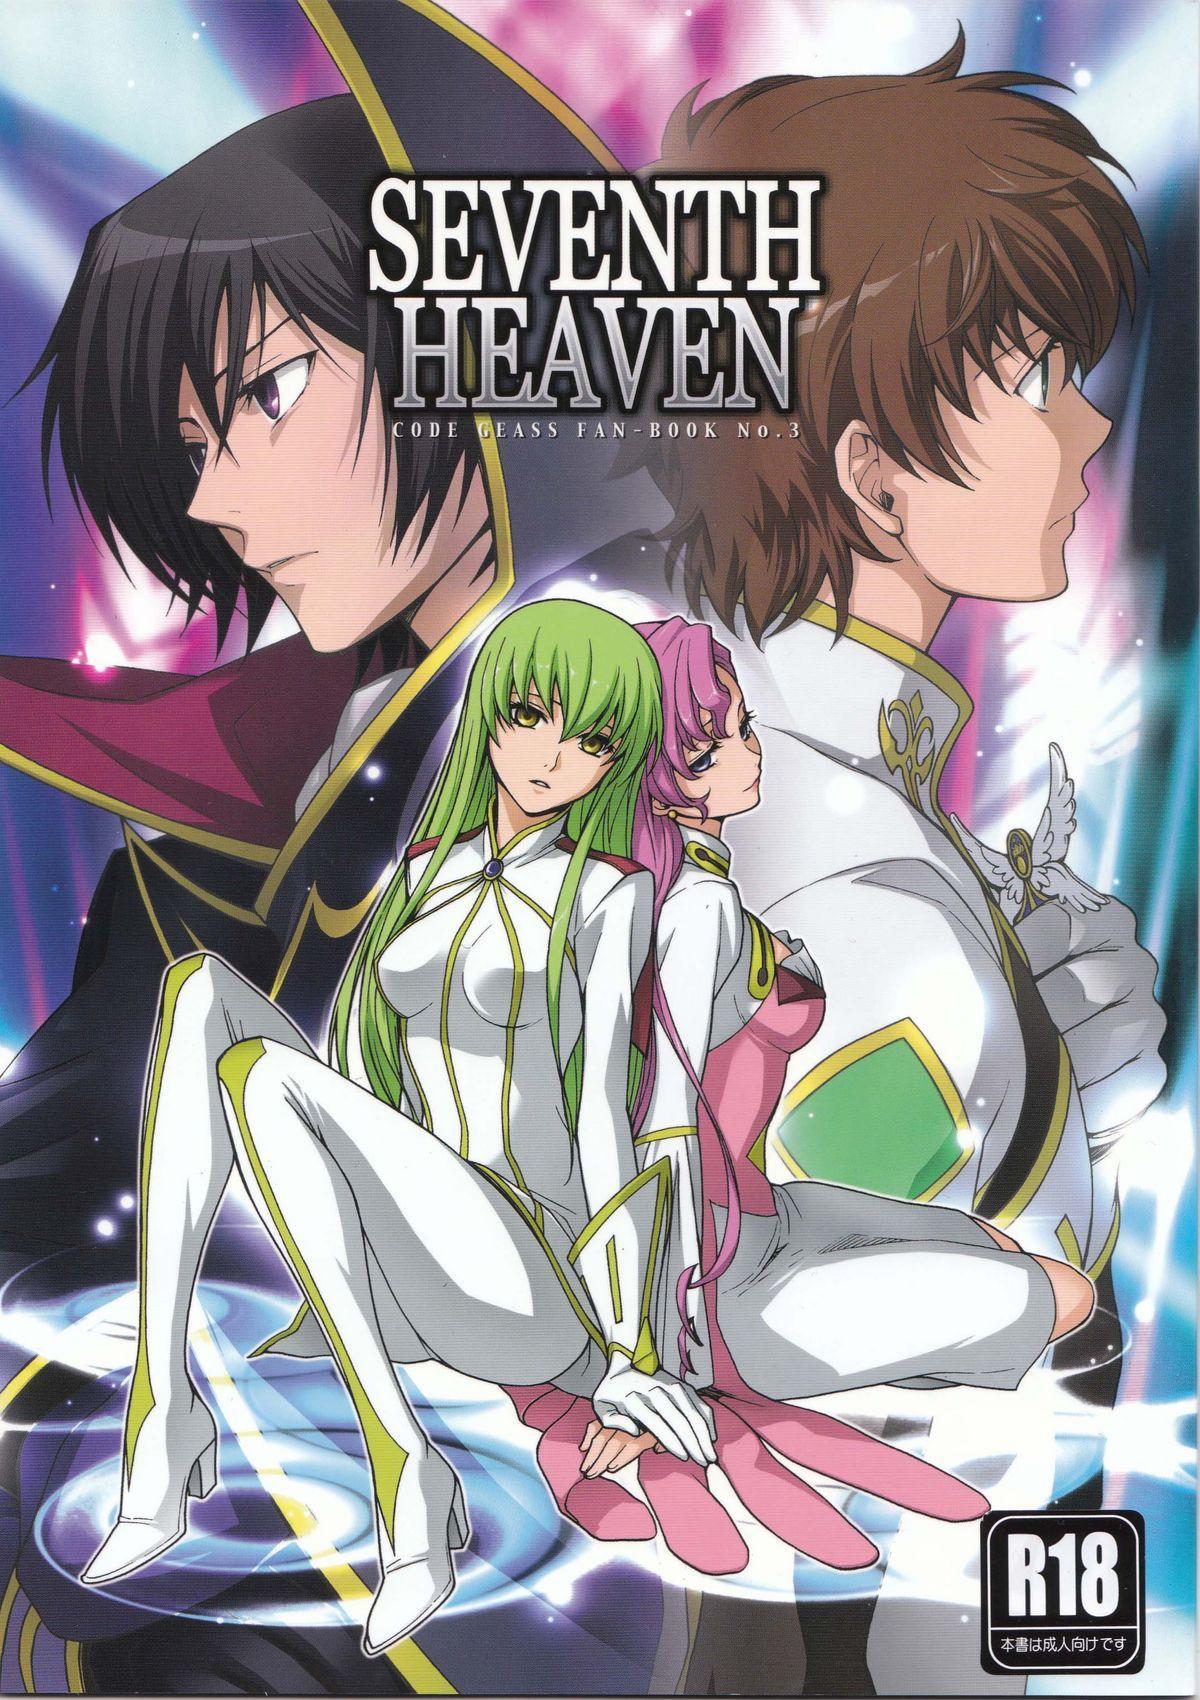 Seventh Heaven 0